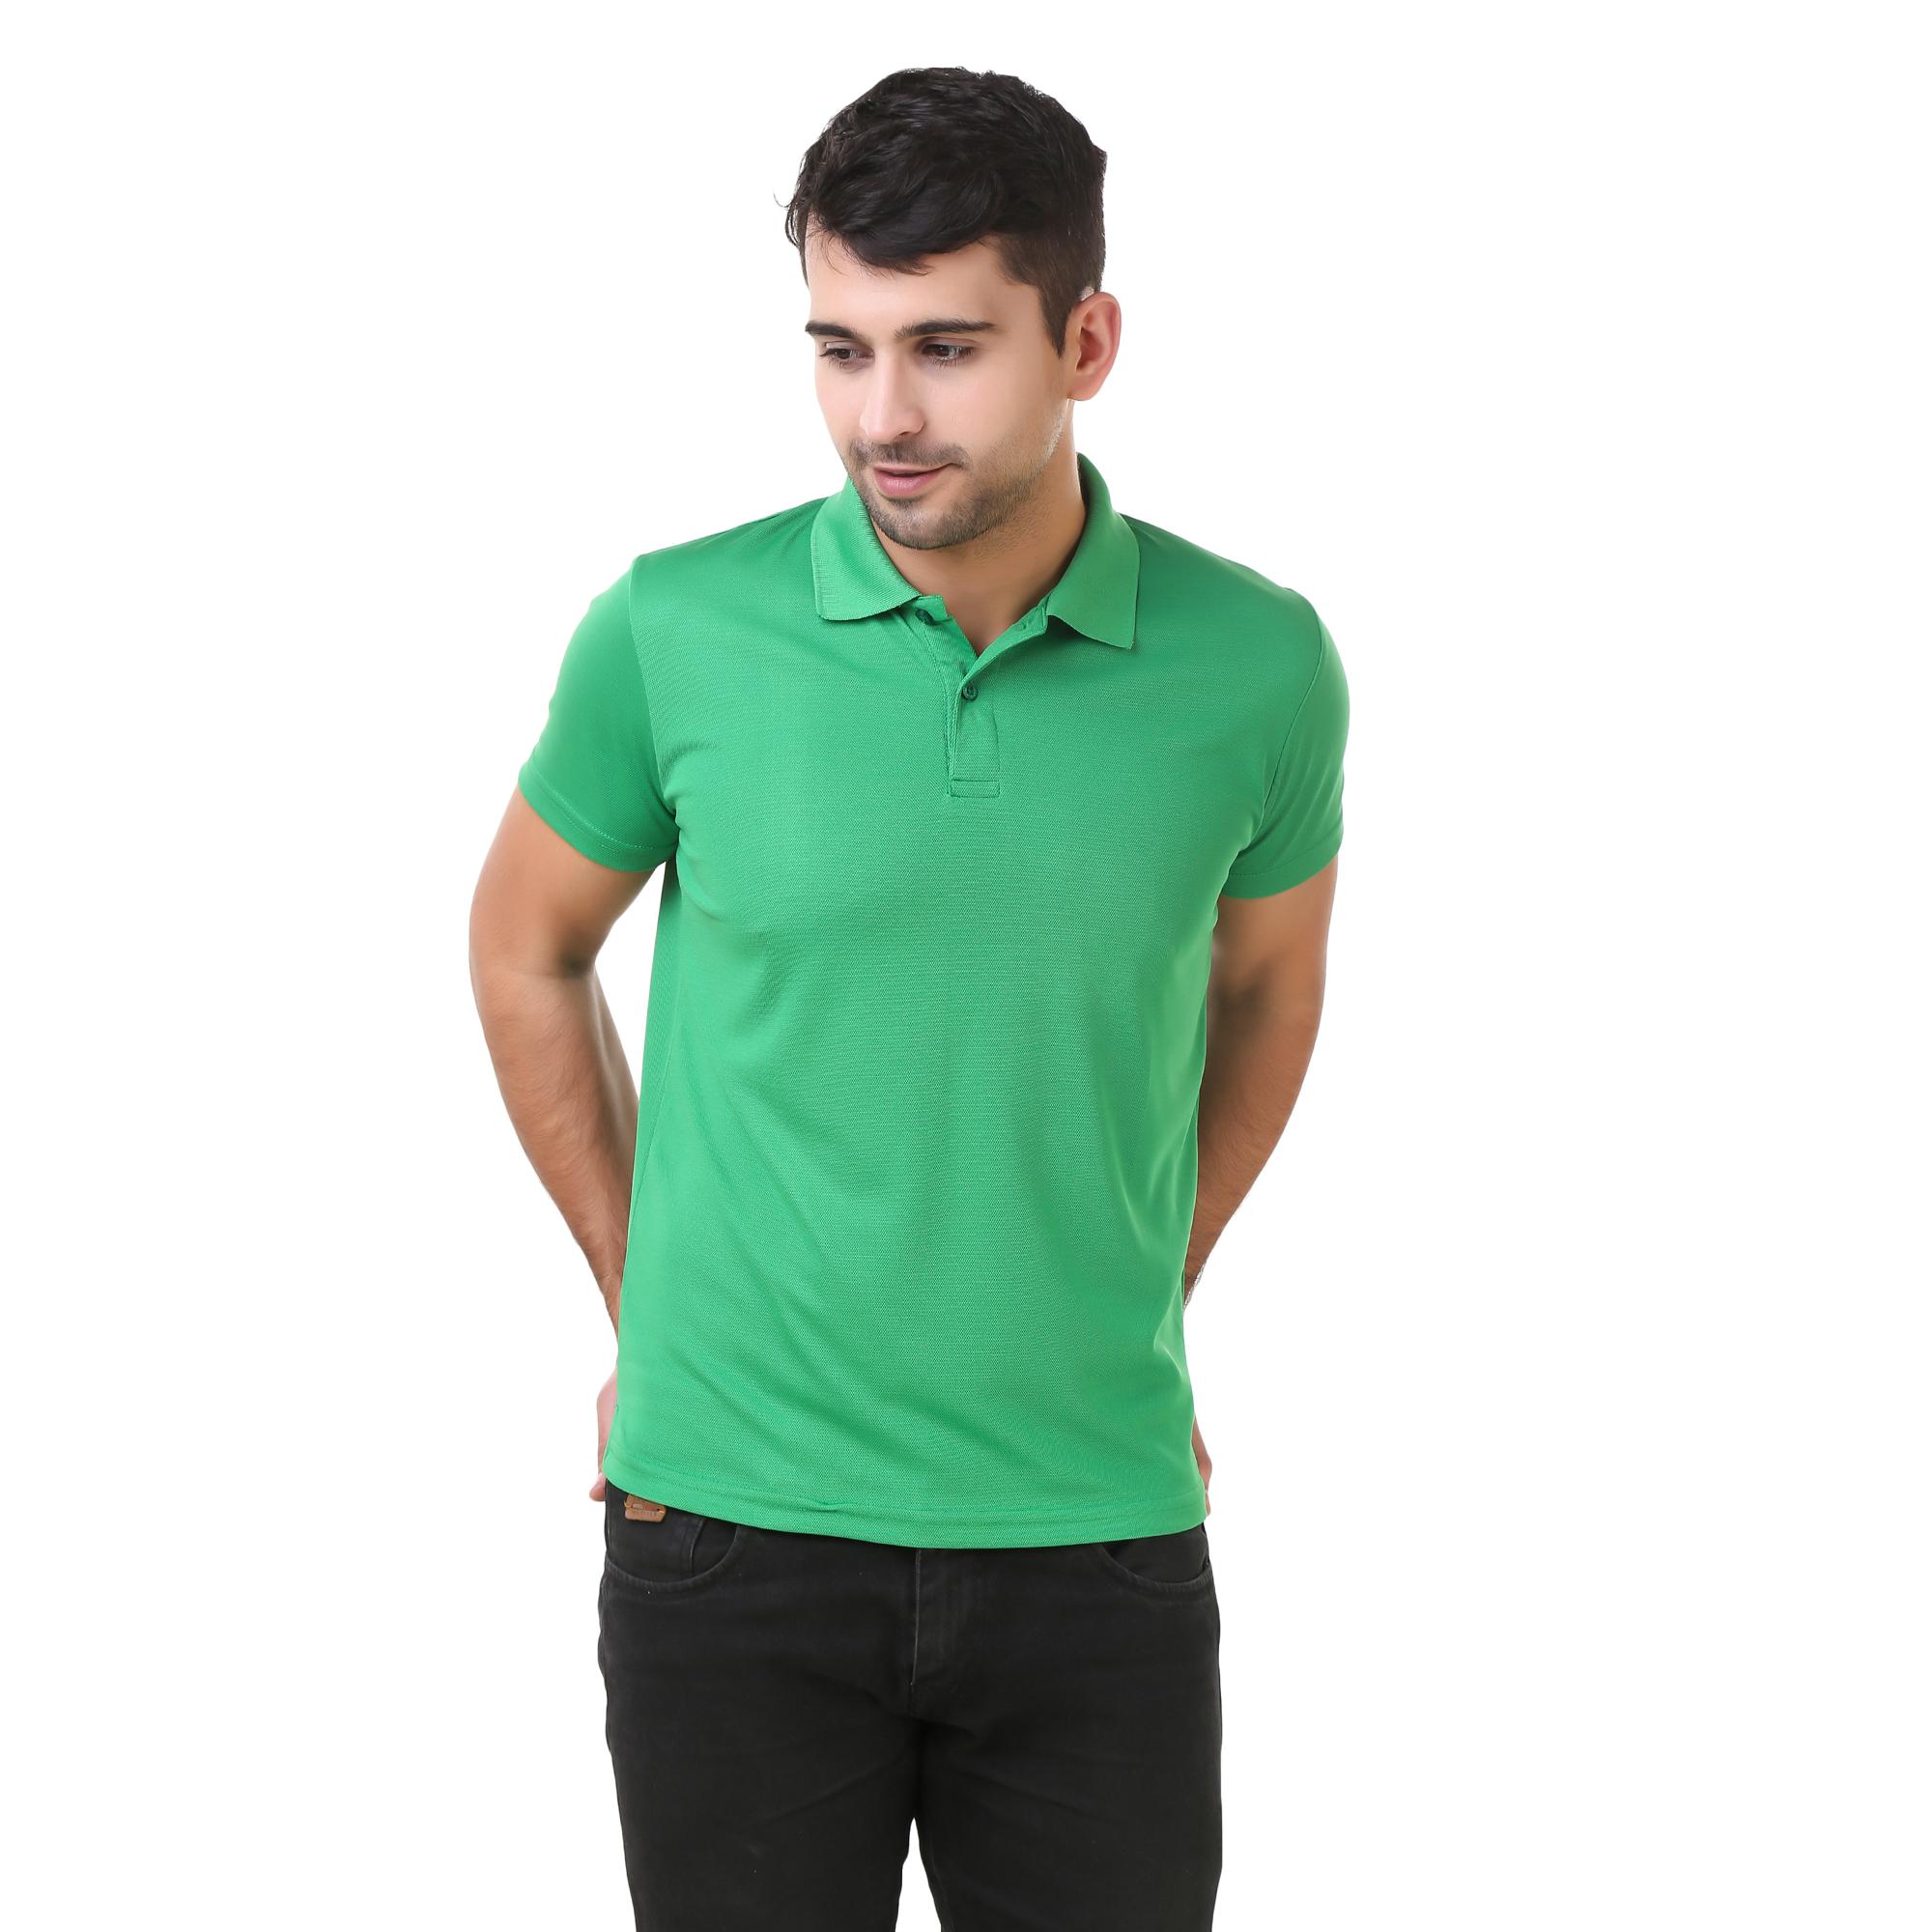 Lotto | Lotto Men's Polo Basic Parrot Green T-Shirt